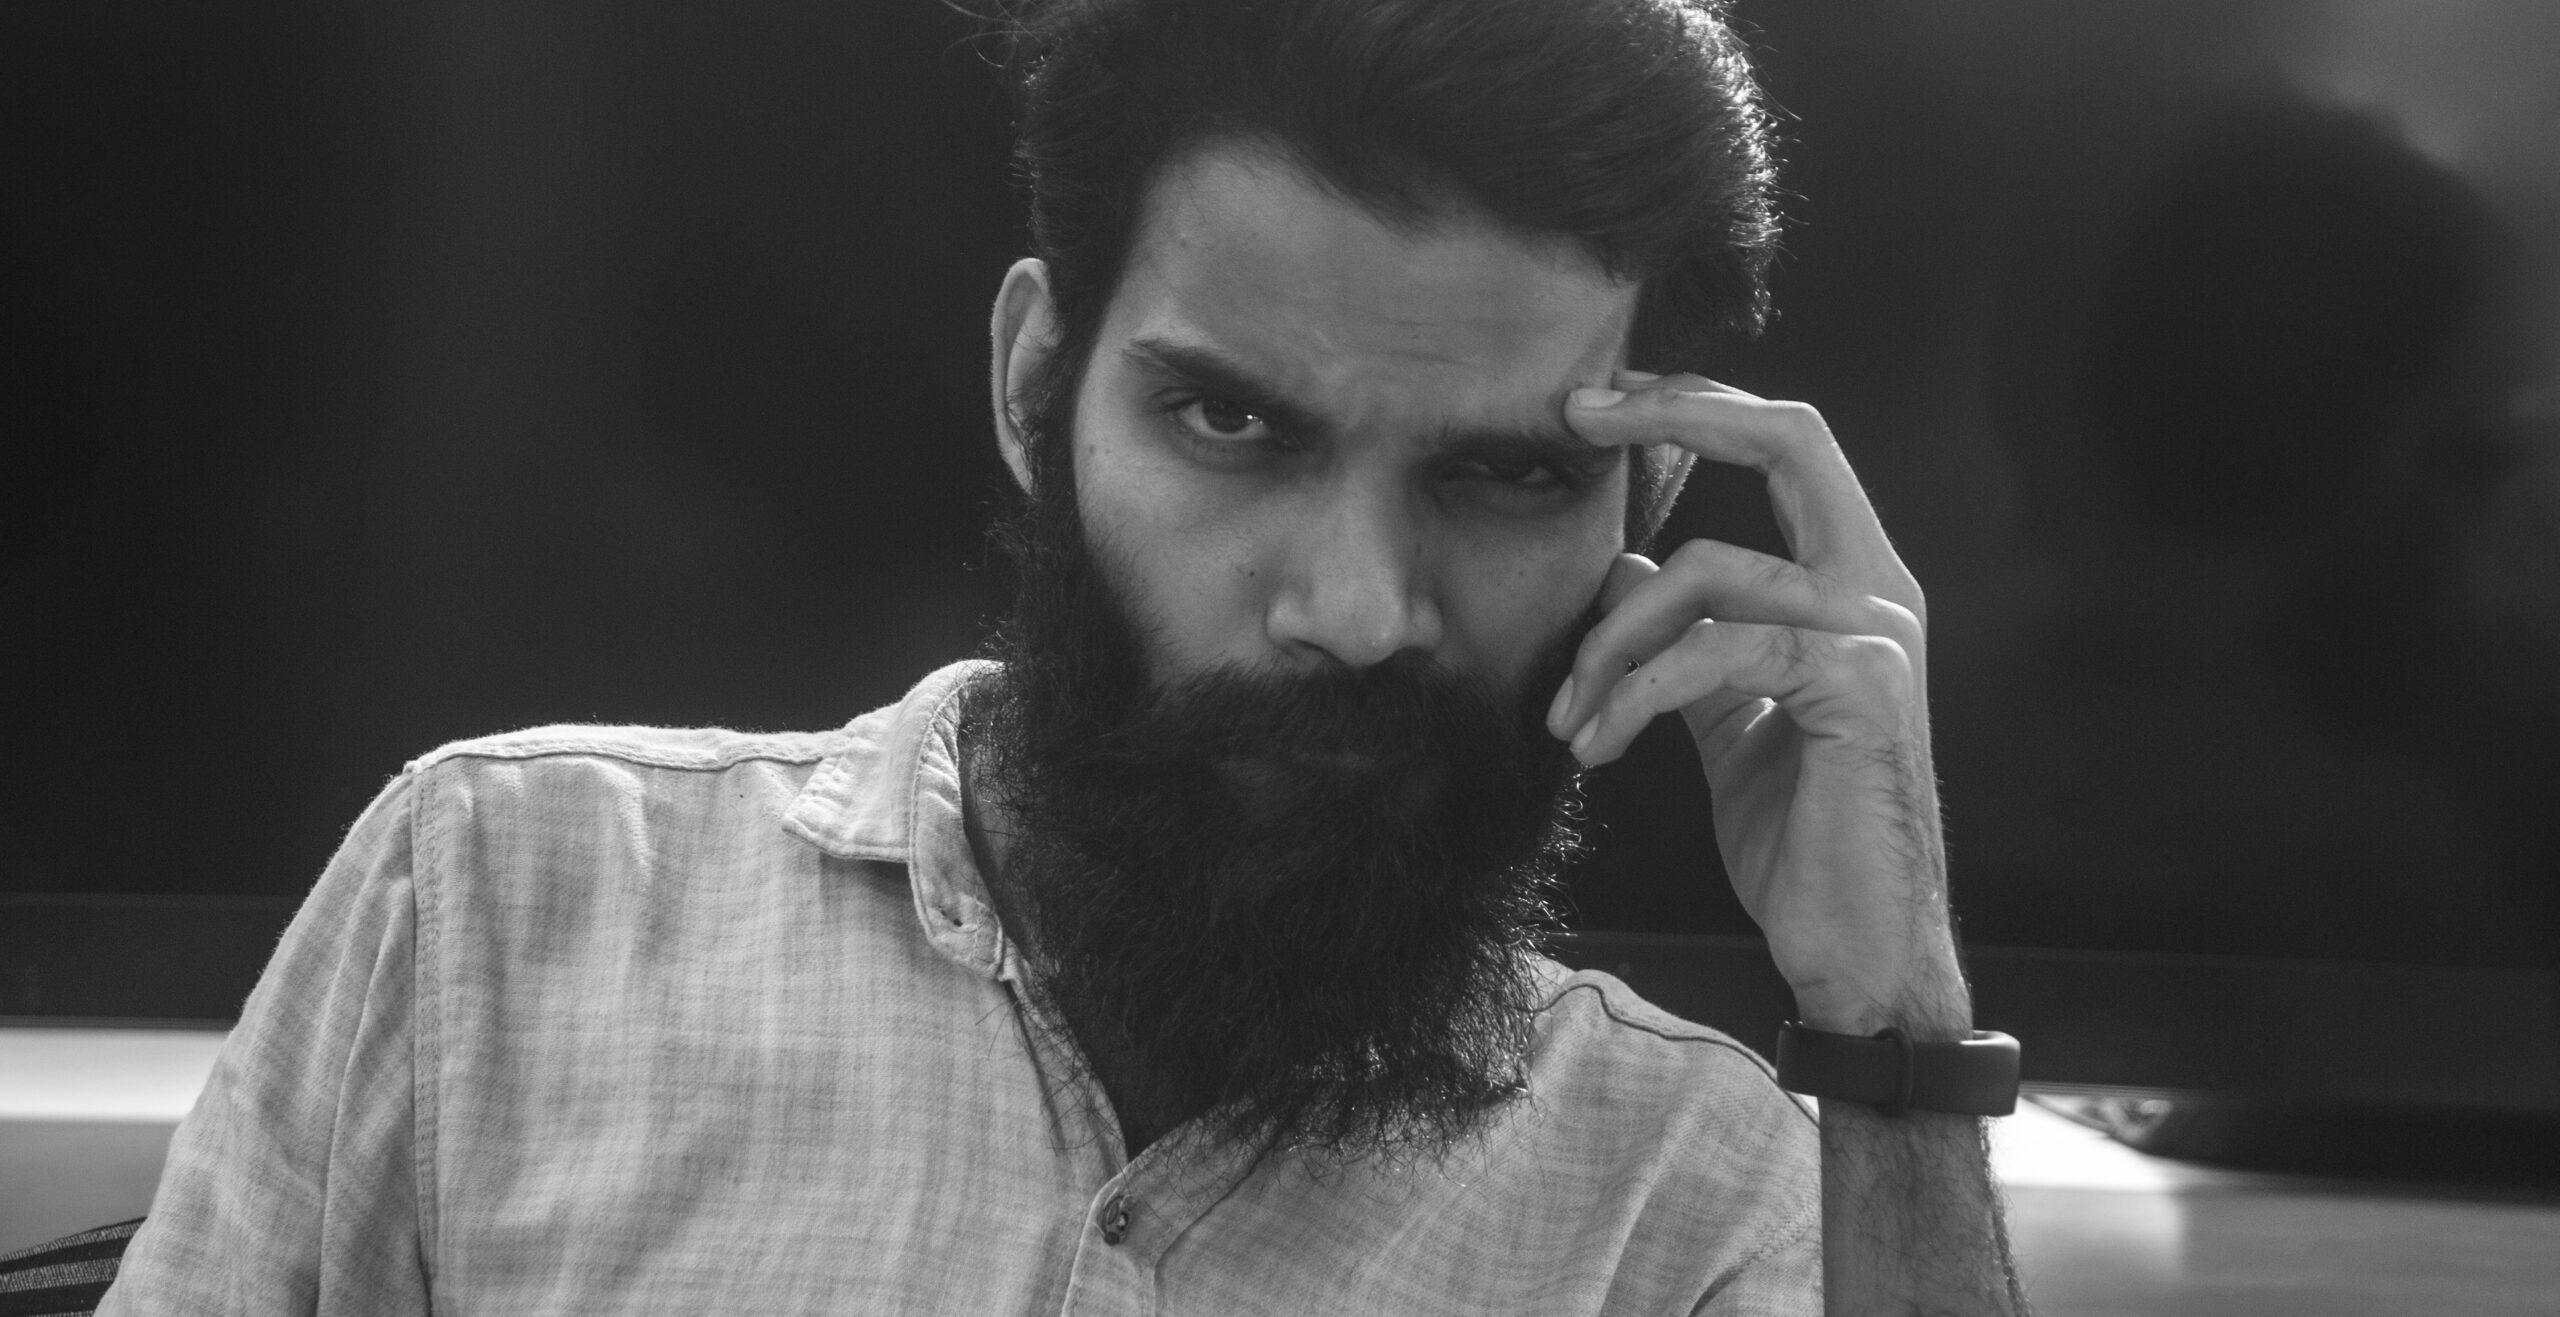 Anubhav Gangwar